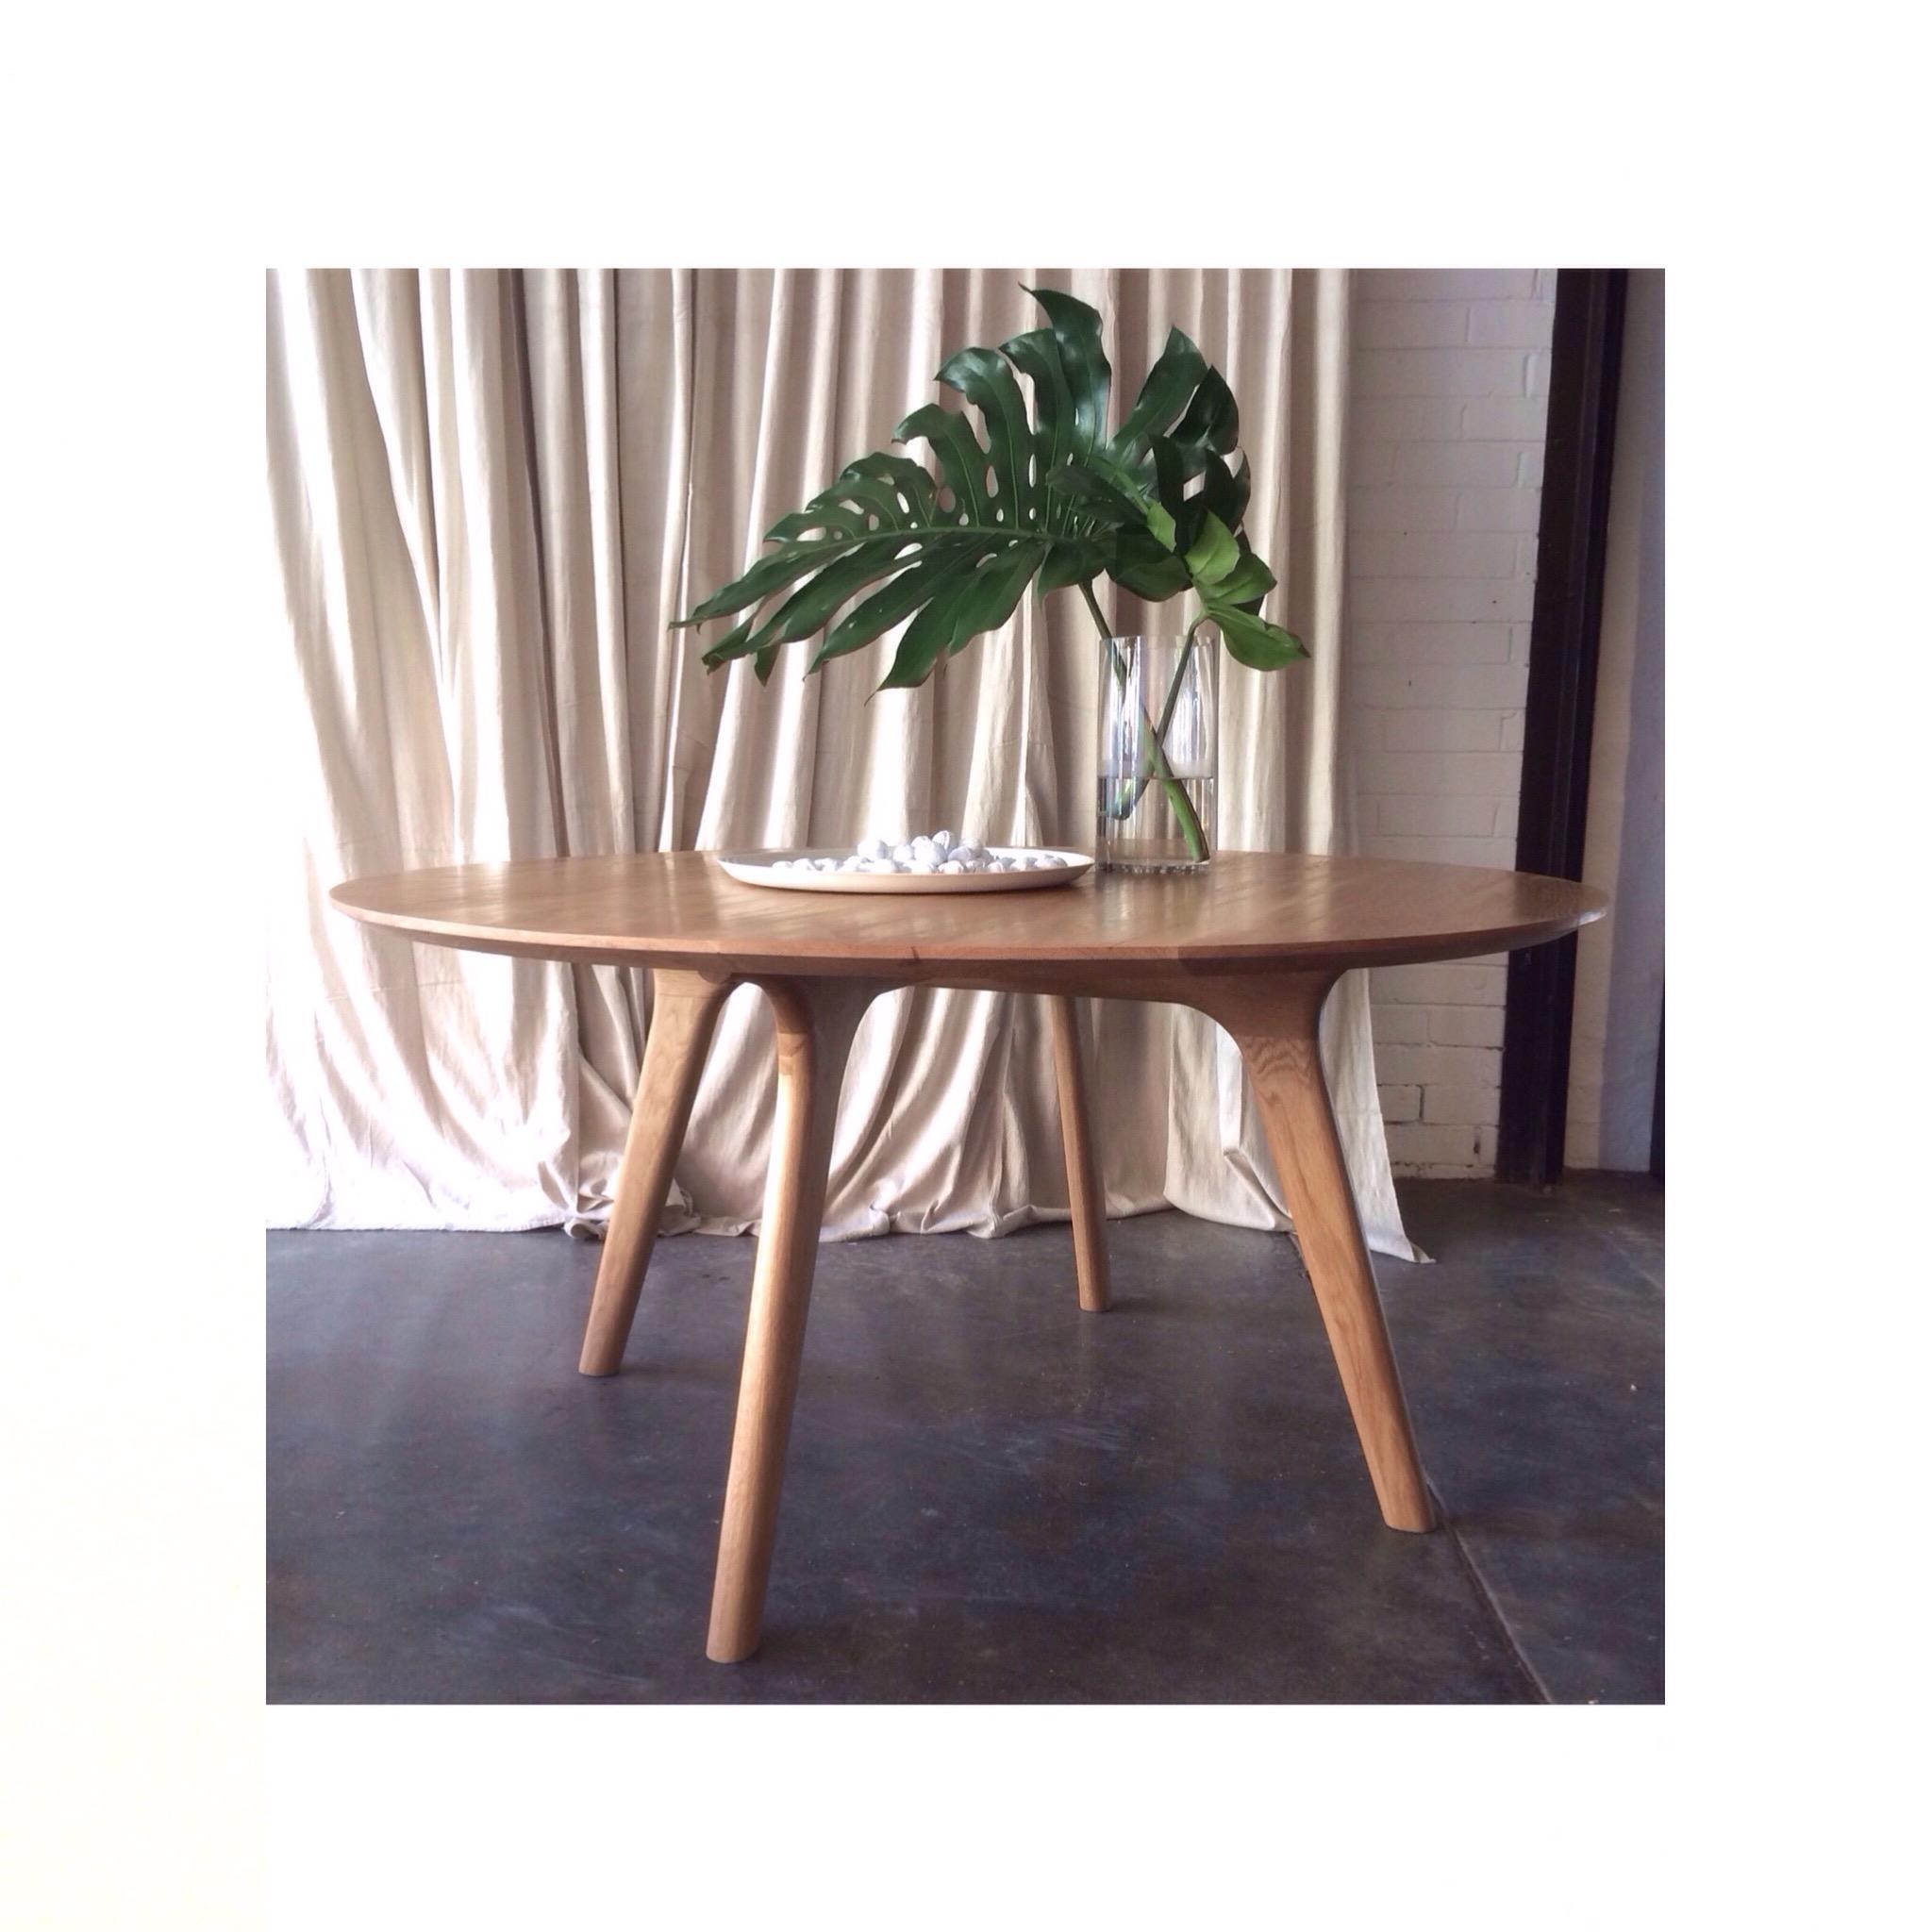 earl_pinto_melbourne_furniture_store_designer_table.JPG